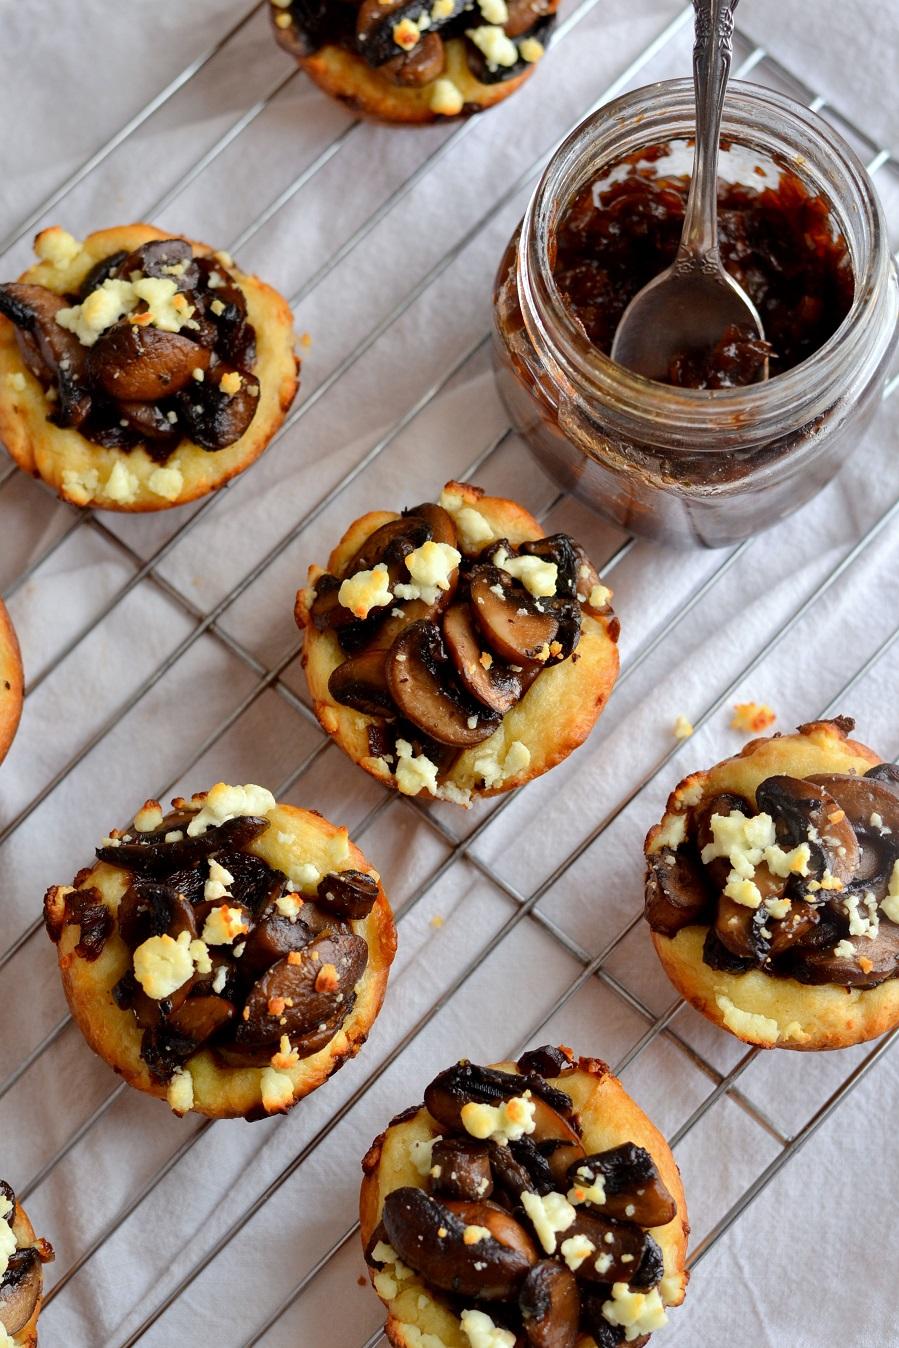 Mushroom Tartlets with Caramelized Onion Jam